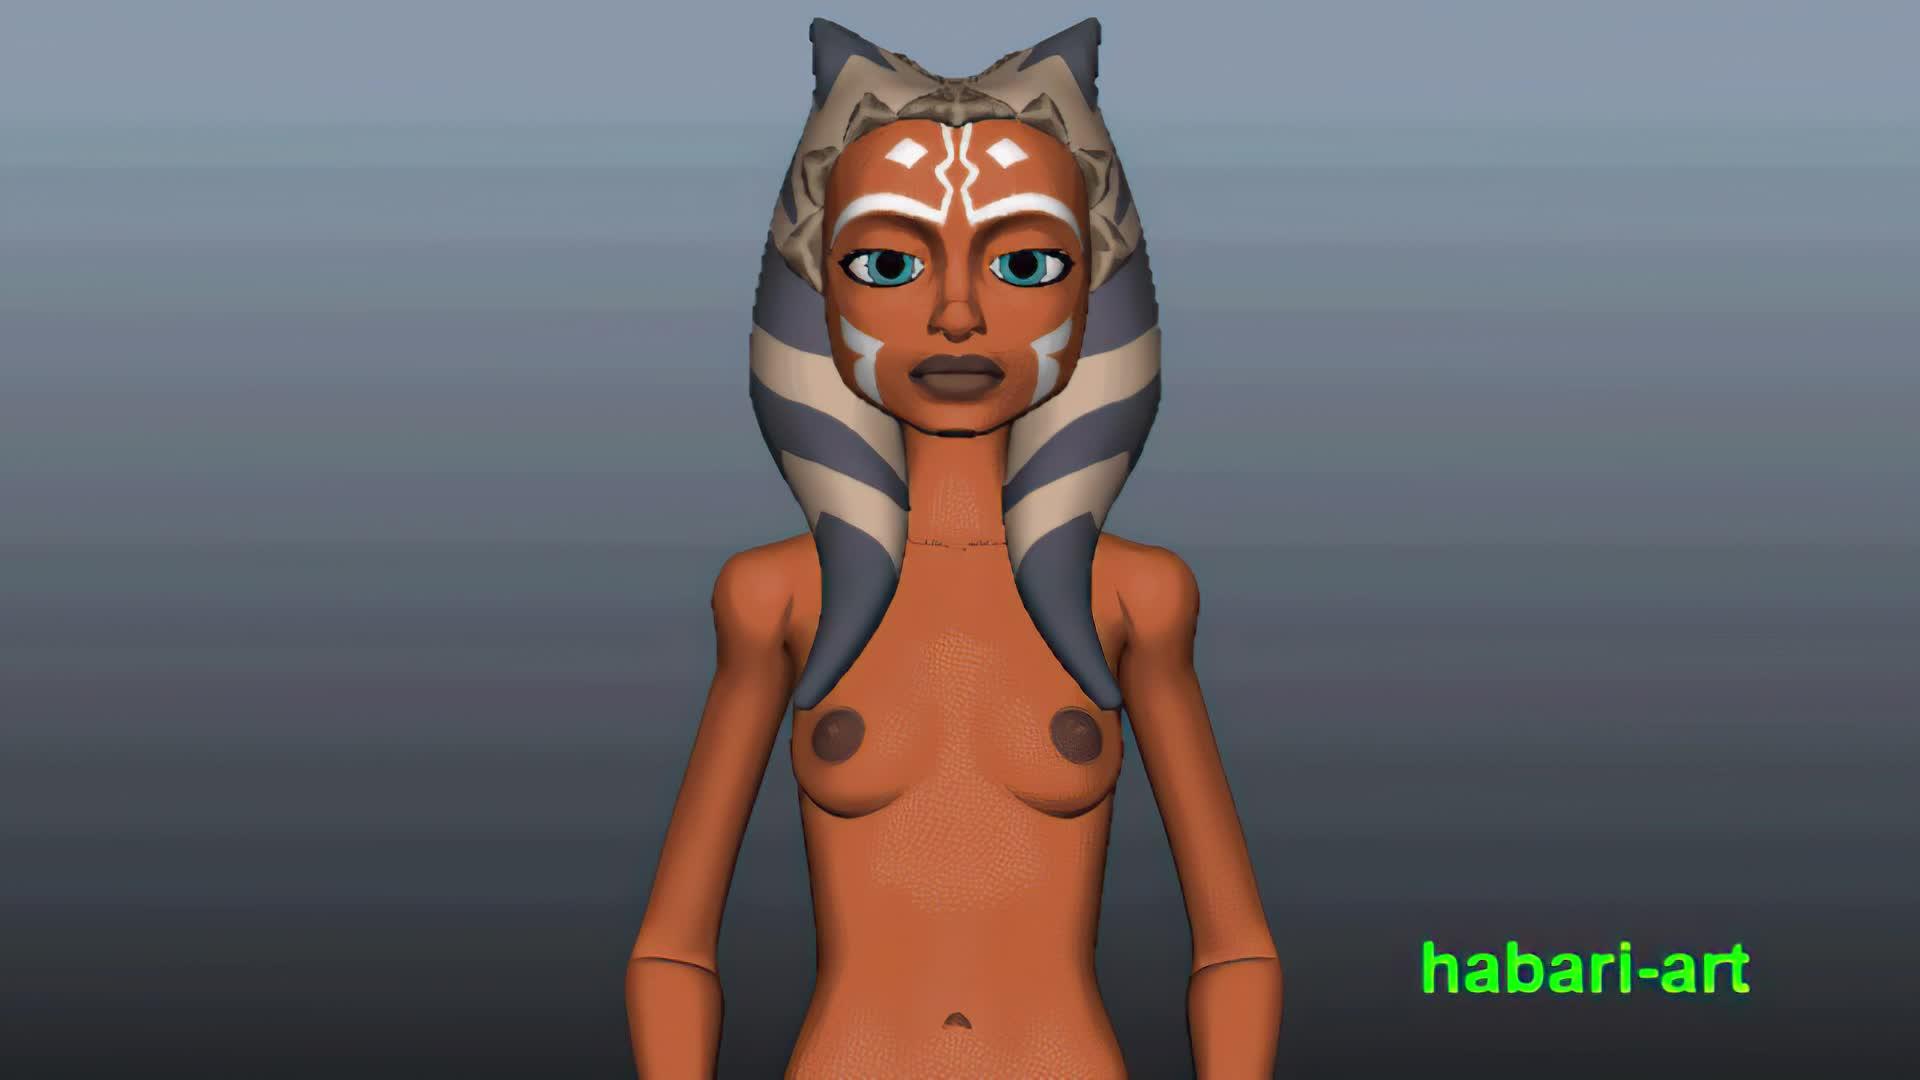 Star wars porn ahsoka tano sexpics download erotic and porn images